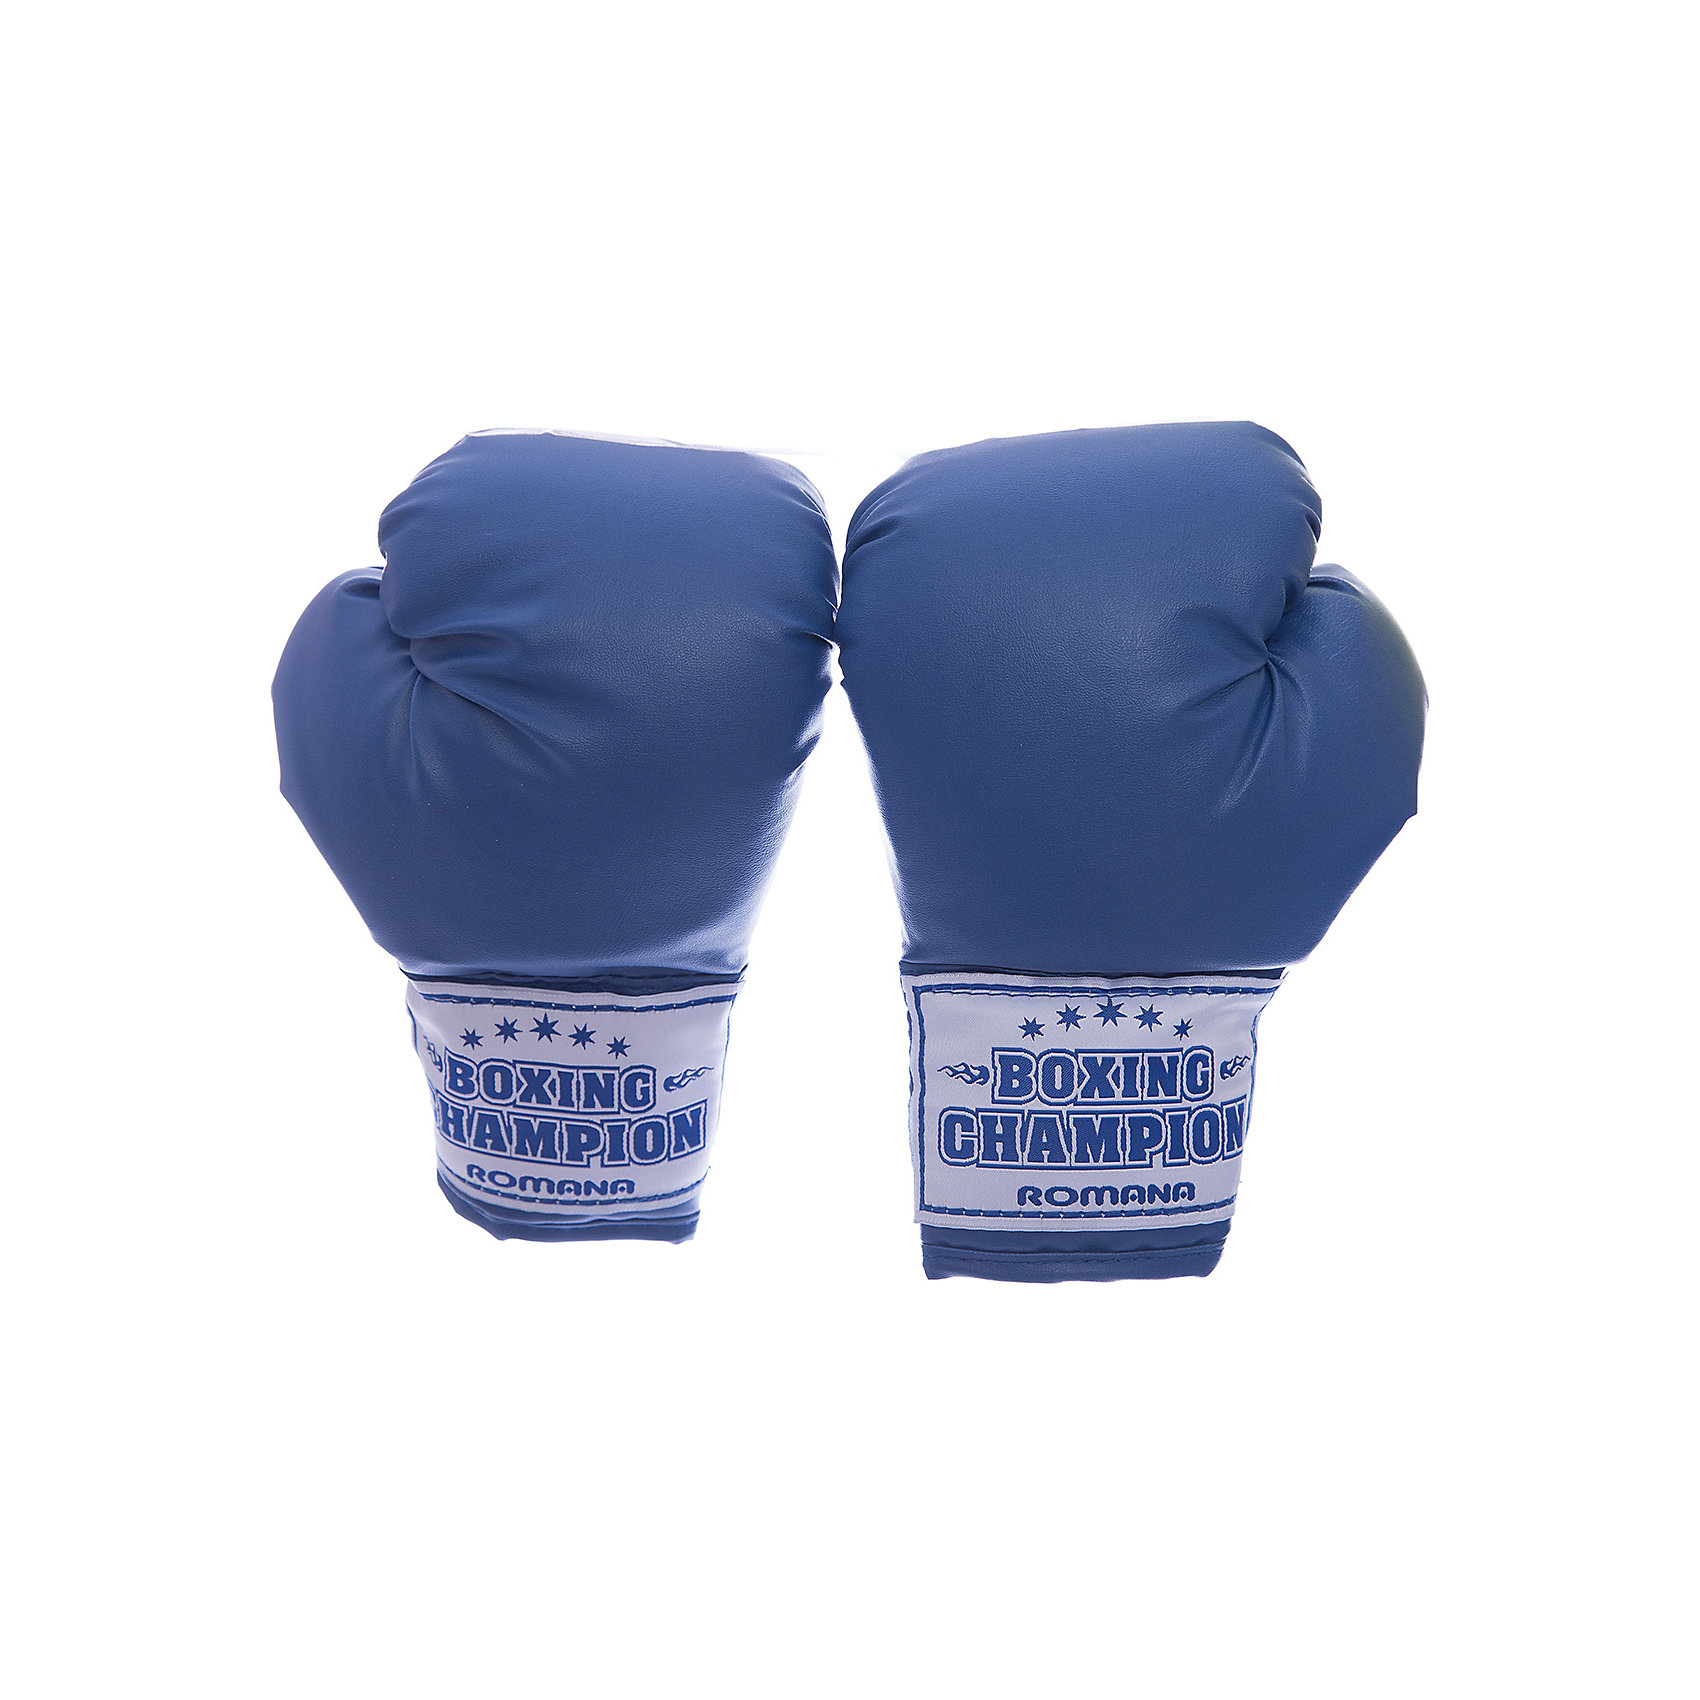 ROMANA Боксерские перчатки для детей 5-7 лет, ROMANA боксерские перчатки в магазинах москвы